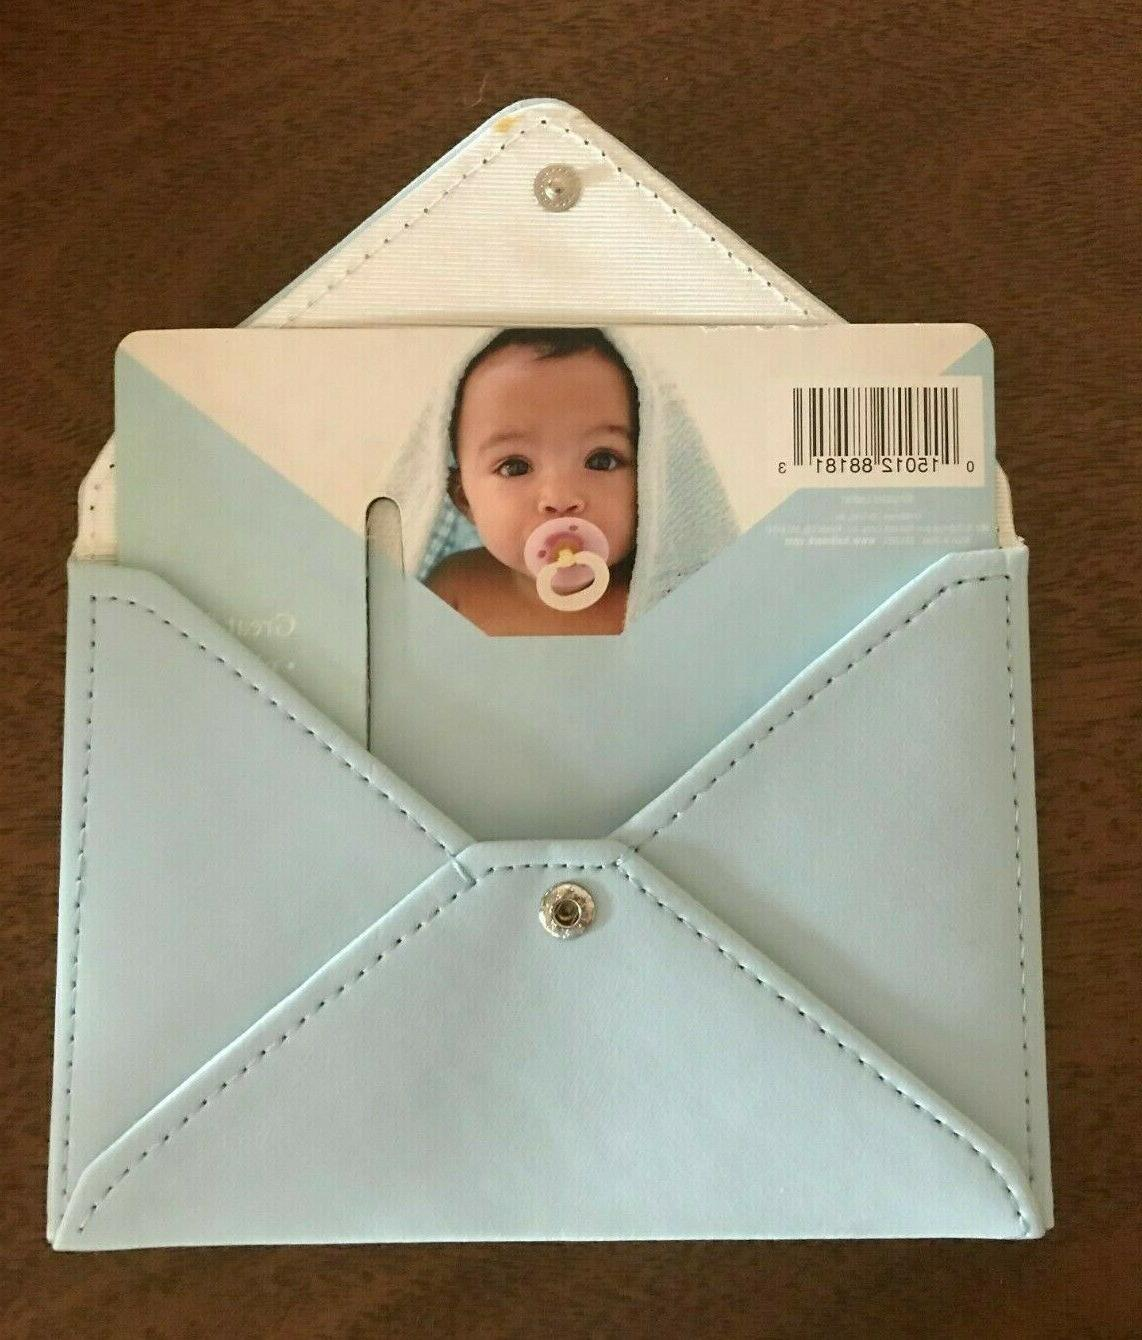 blue envelope wallet holder coupon photo picture